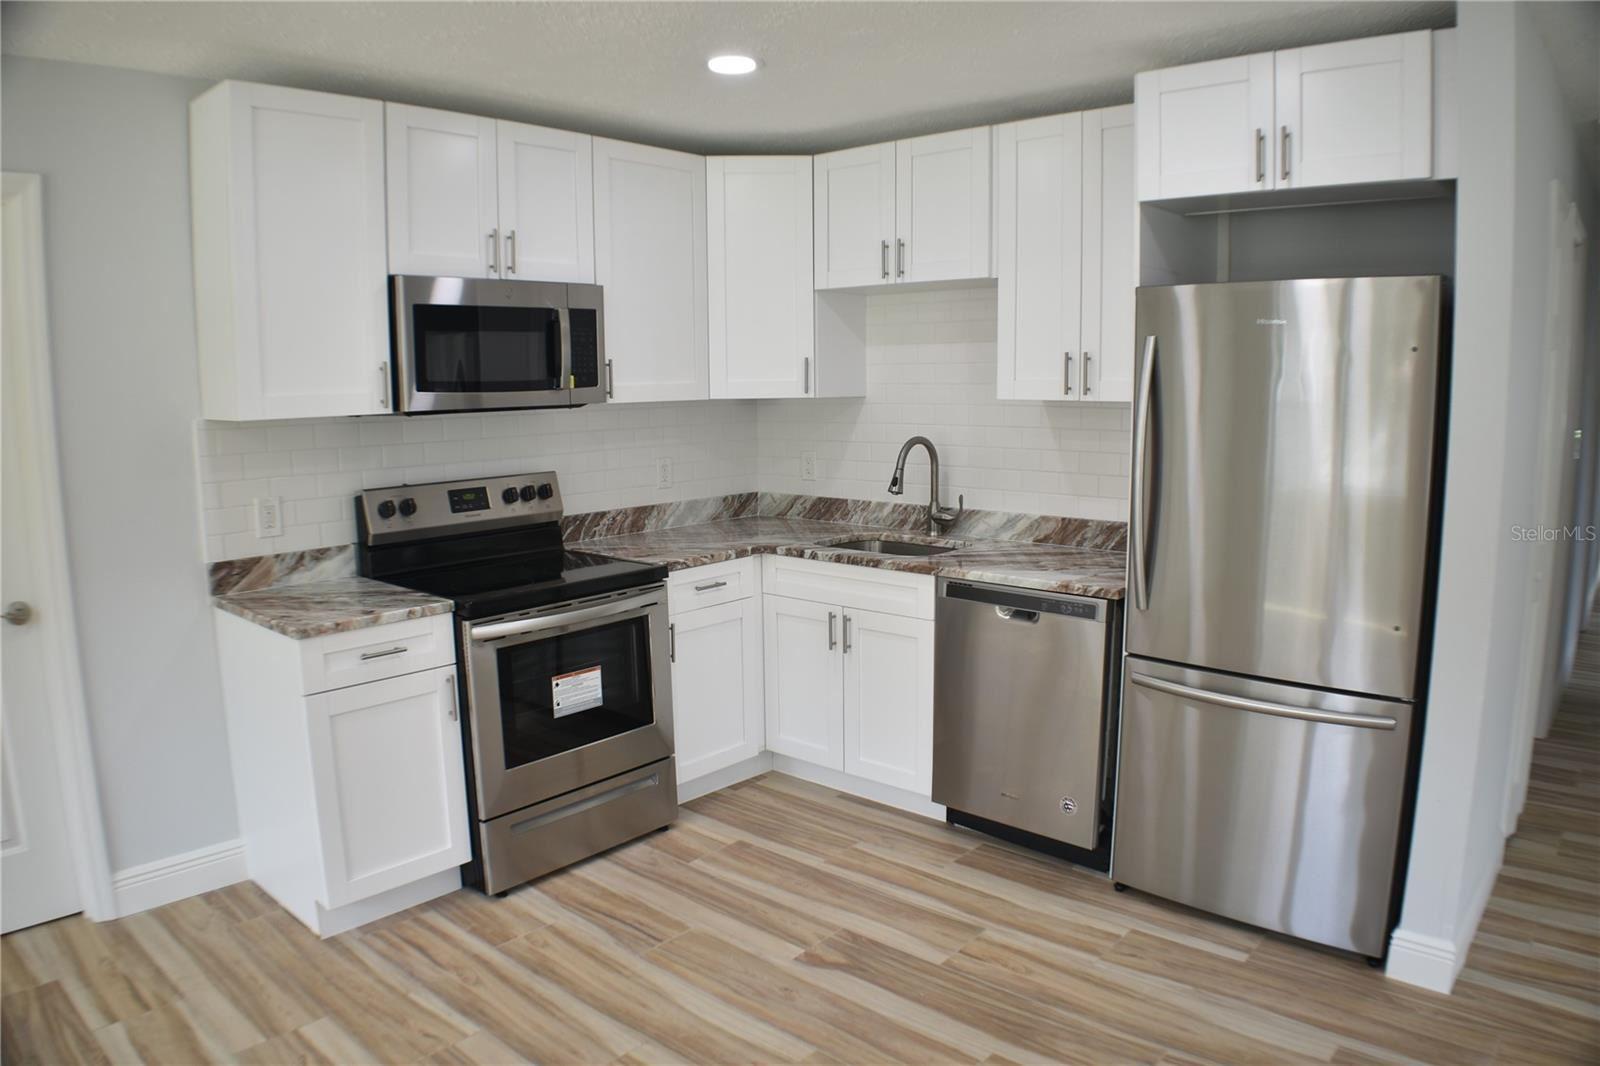 Photo of 116 EMERALD LANE, LARGO, FL 33771 (MLS # U8132097)